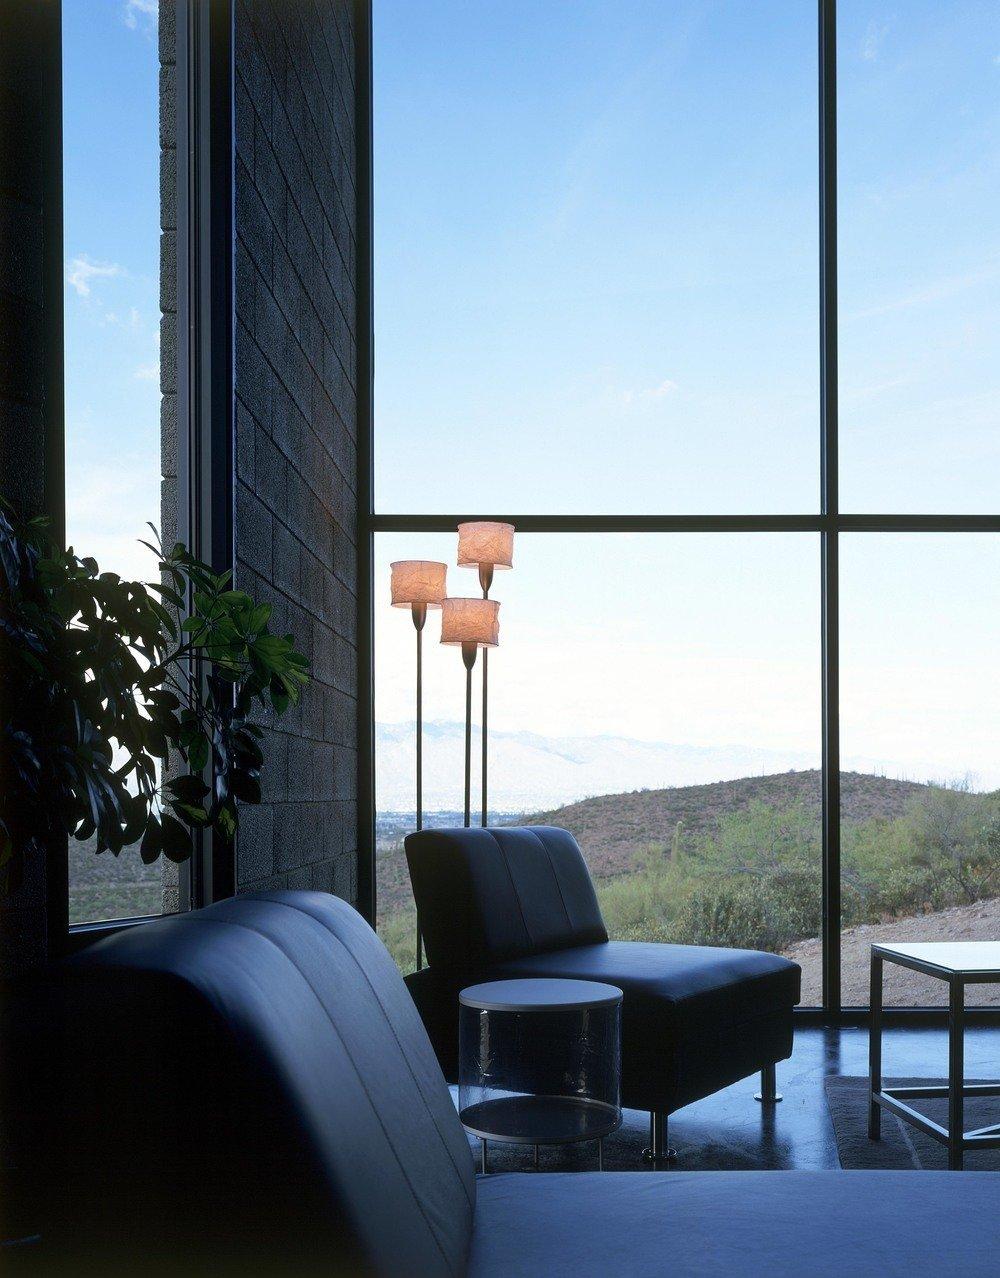 #modern #garciaresidence #ibarrarosanodesignarchitects #architecture #landscape #interior #arizona #indoor #seatingdesign #lightingdesign #livingroom #openfloor  Garcia Residence